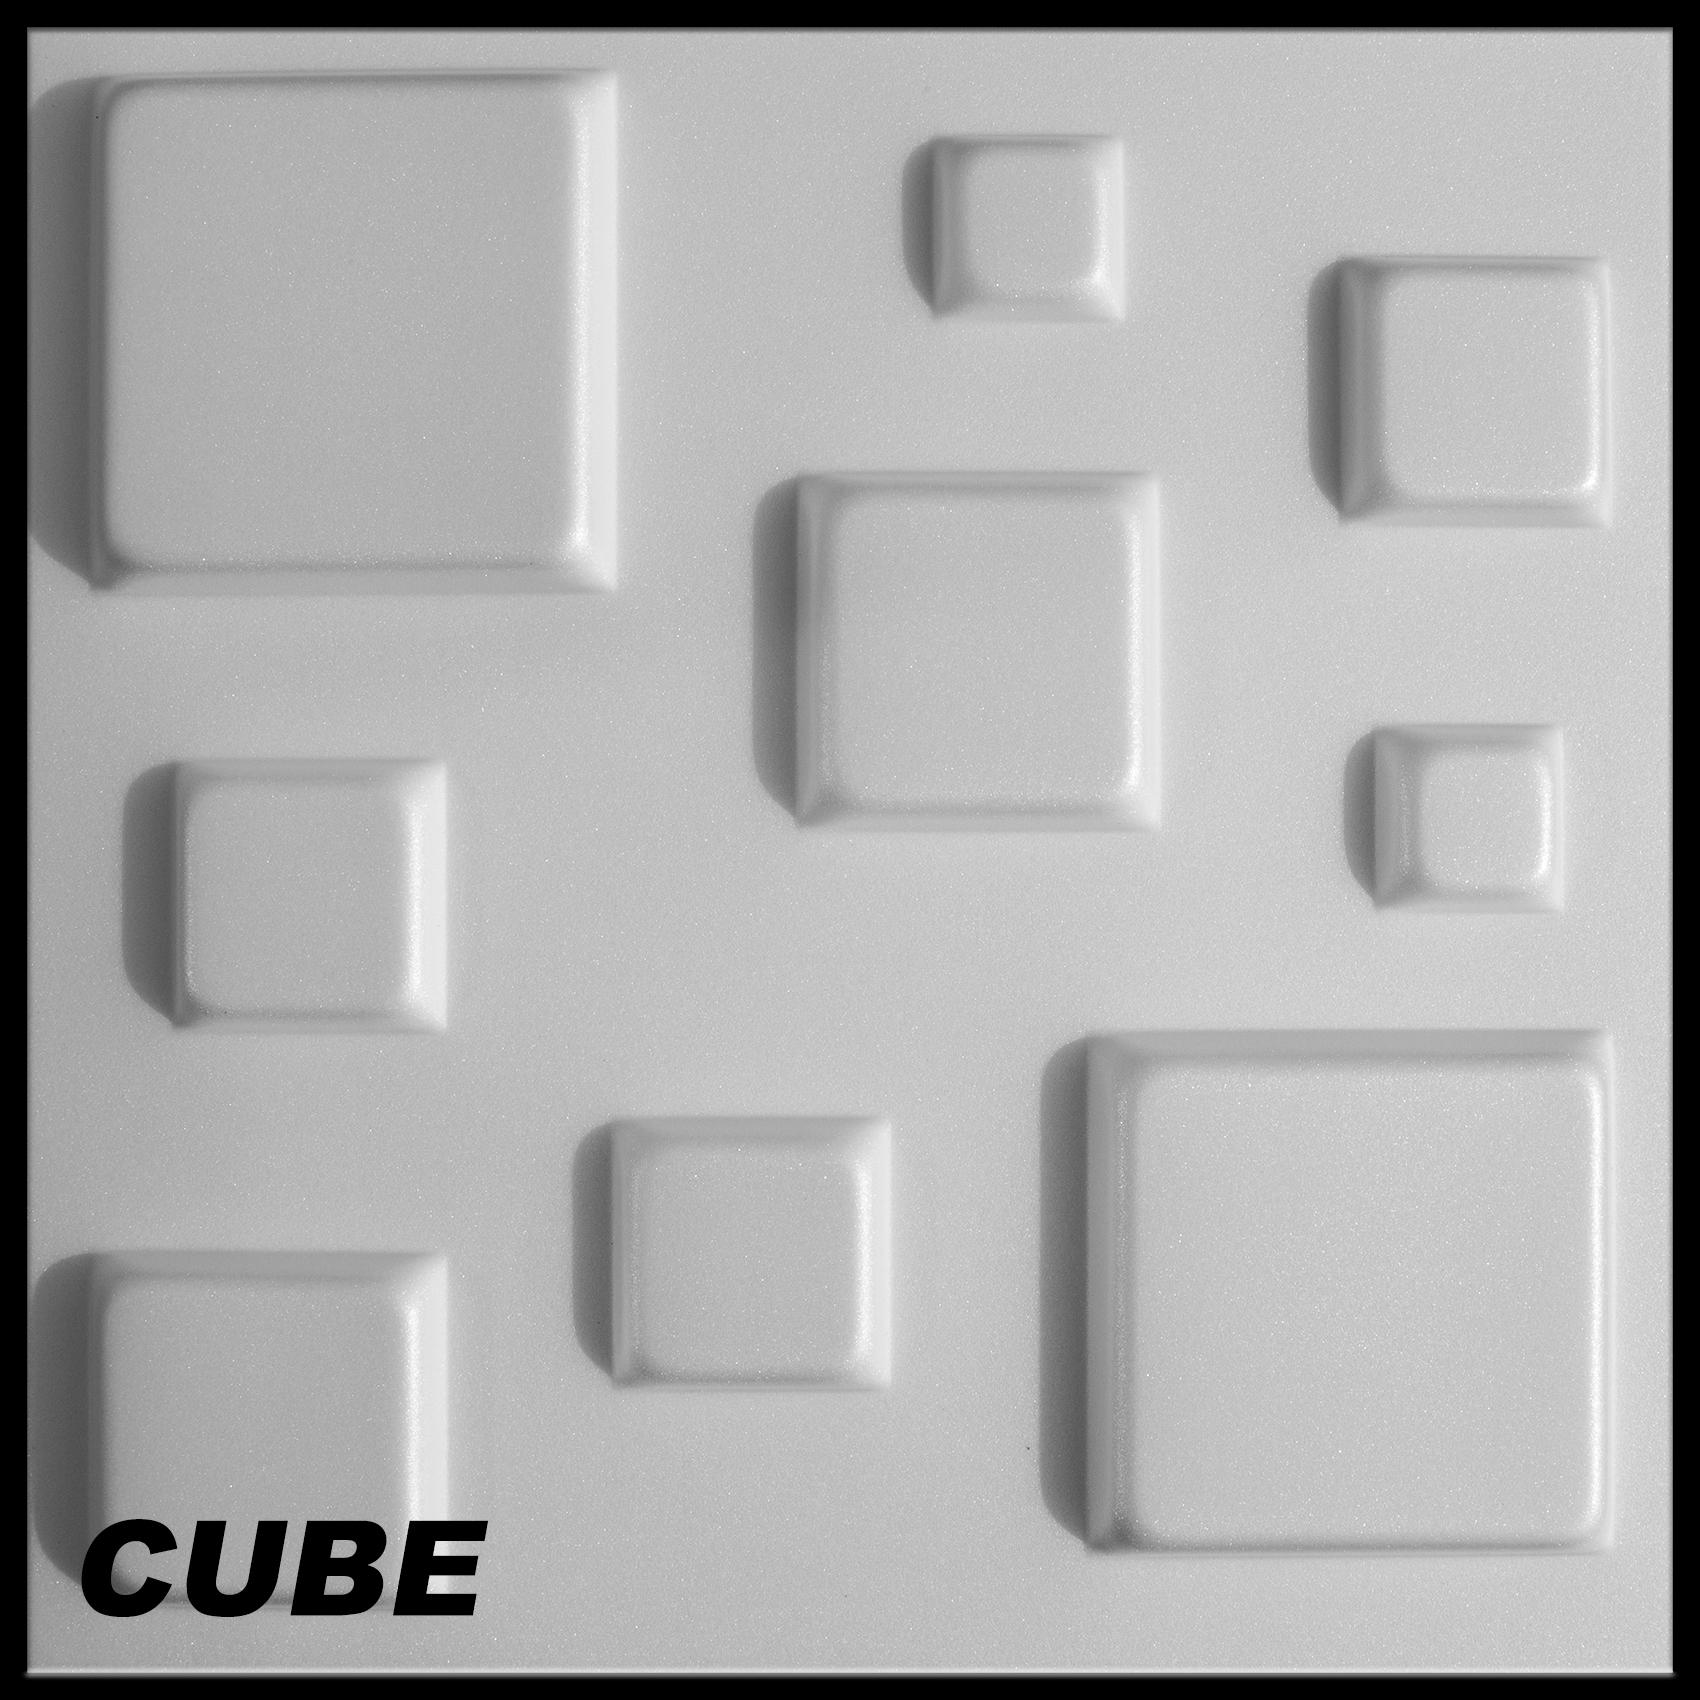 1 m2 platten 3d polystyrol wand decke paneele wandplatten 50x50cm cube ebay. Black Bedroom Furniture Sets. Home Design Ideas